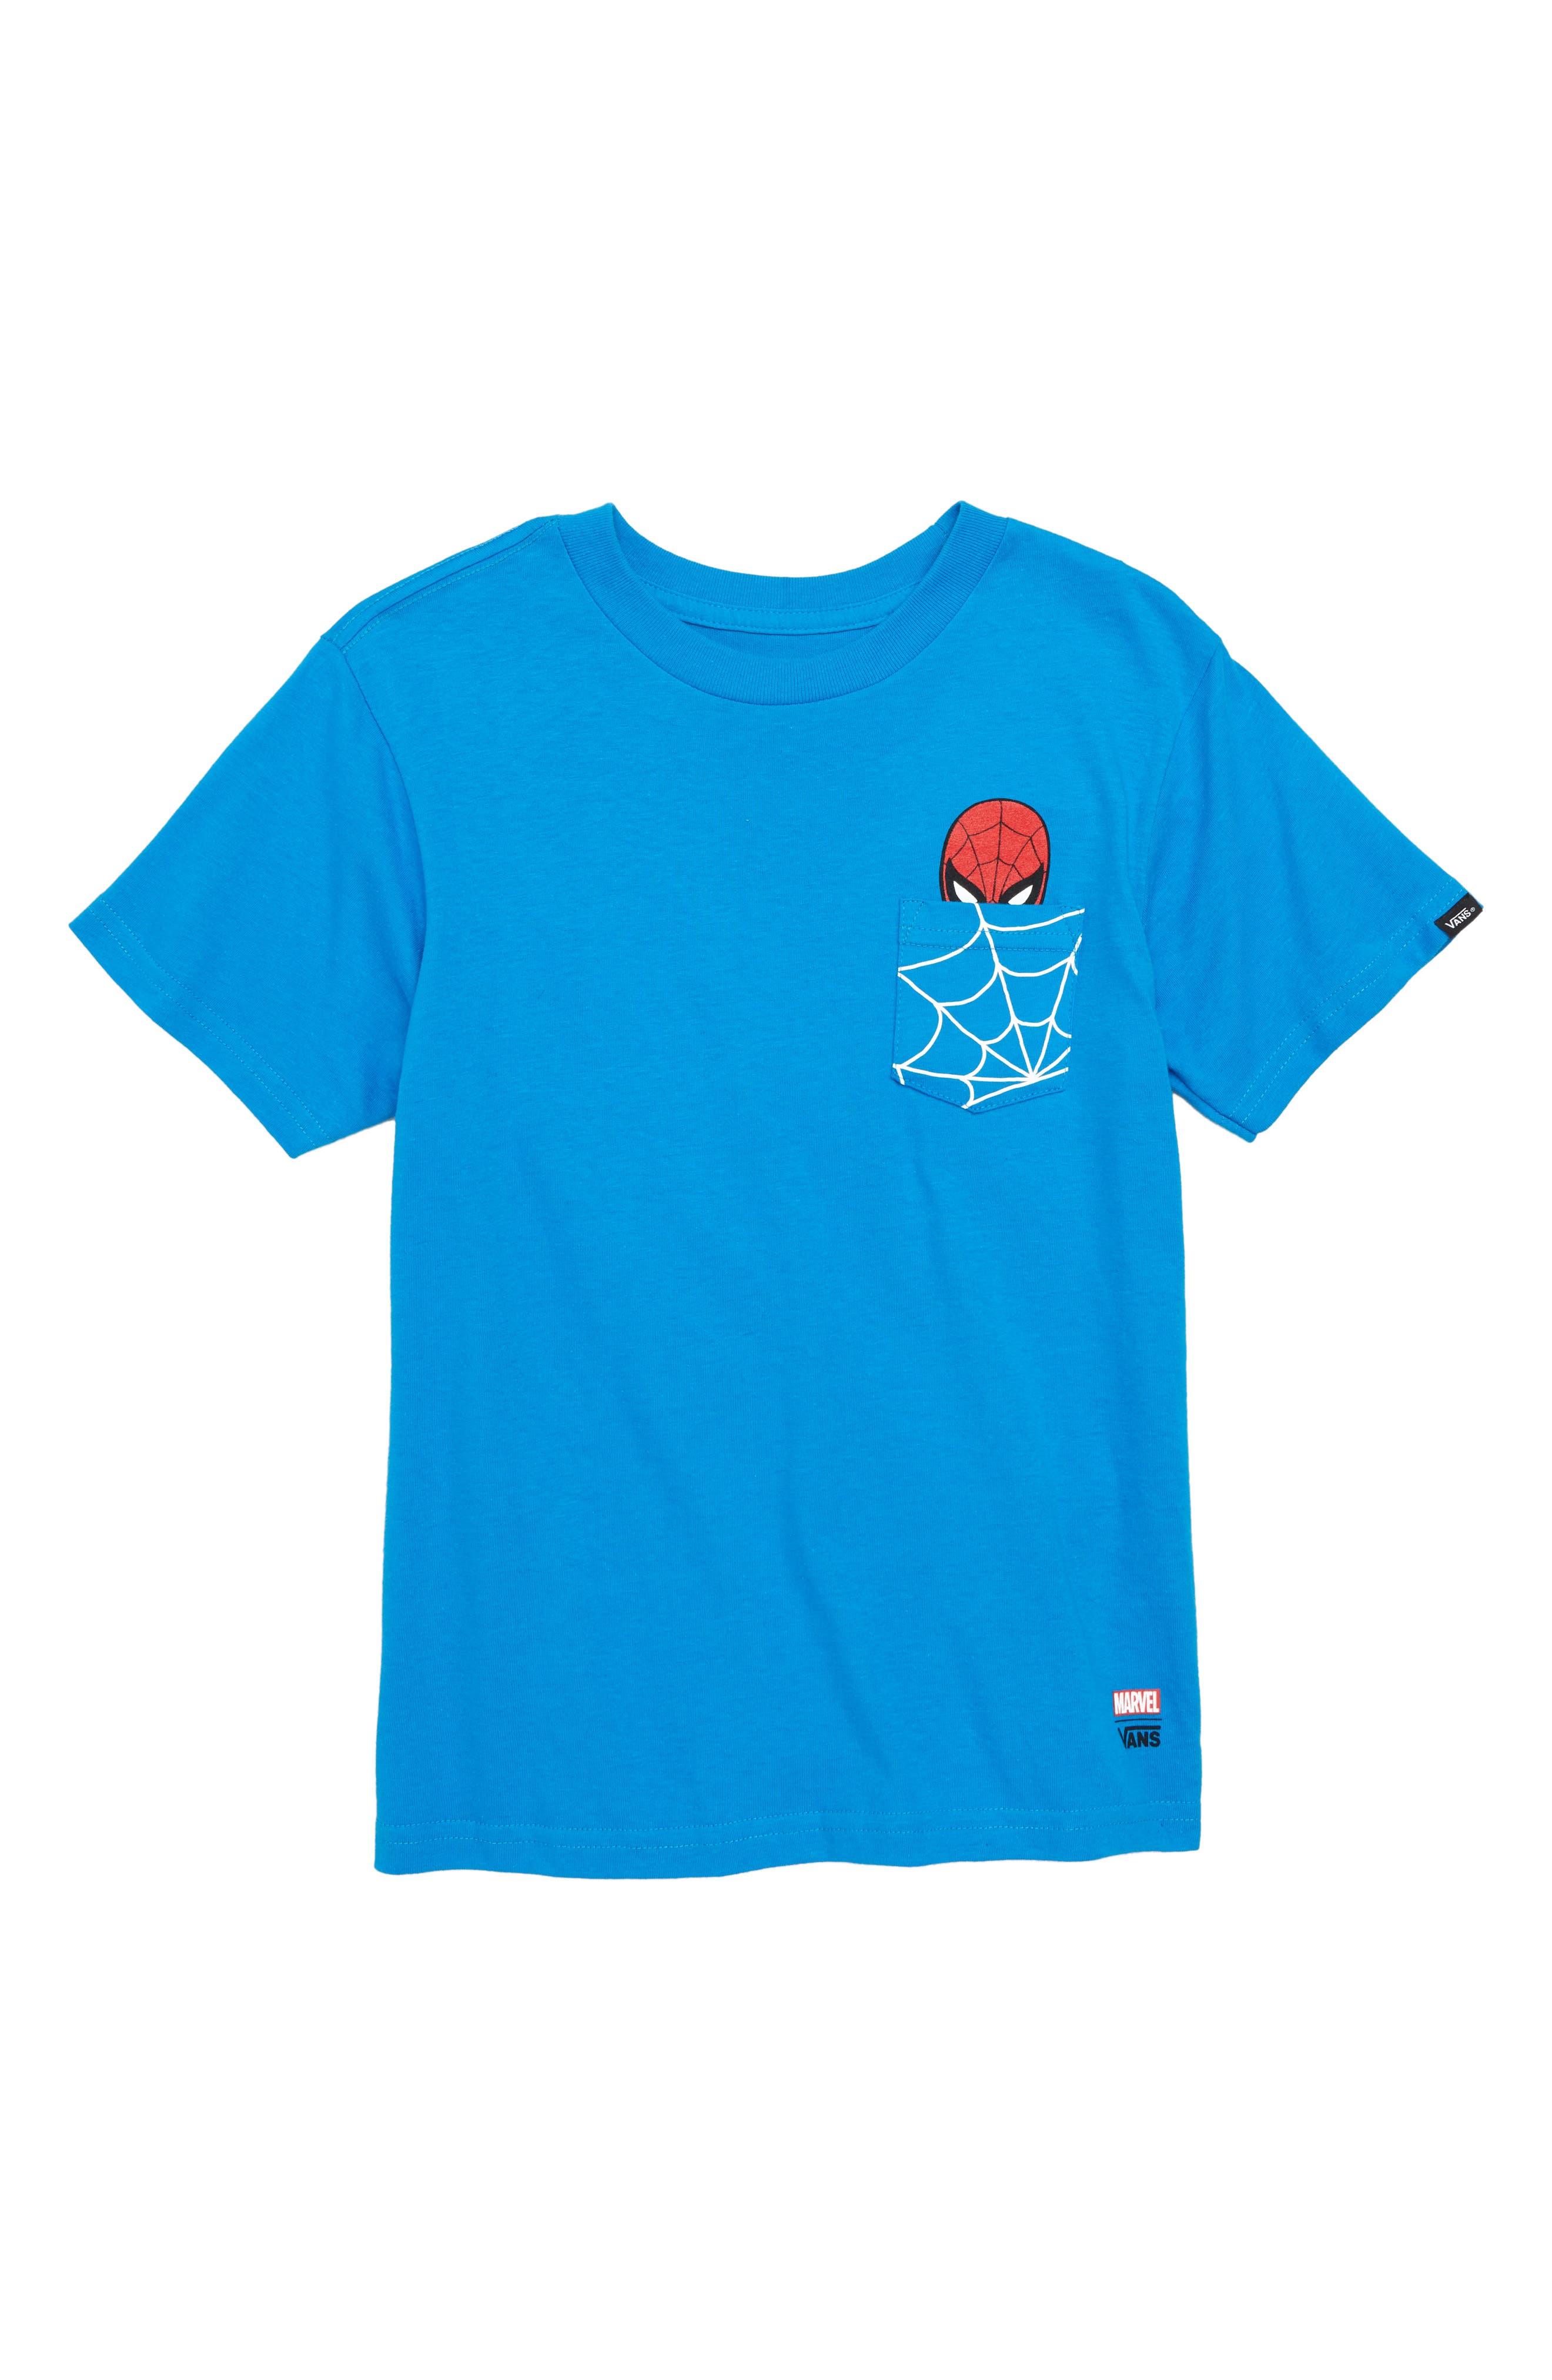 x Marvel<sup>®</sup> Avengers Spider-Man<sup>™</sup> Pocket T-Shirt,                             Main thumbnail 1, color,                             420